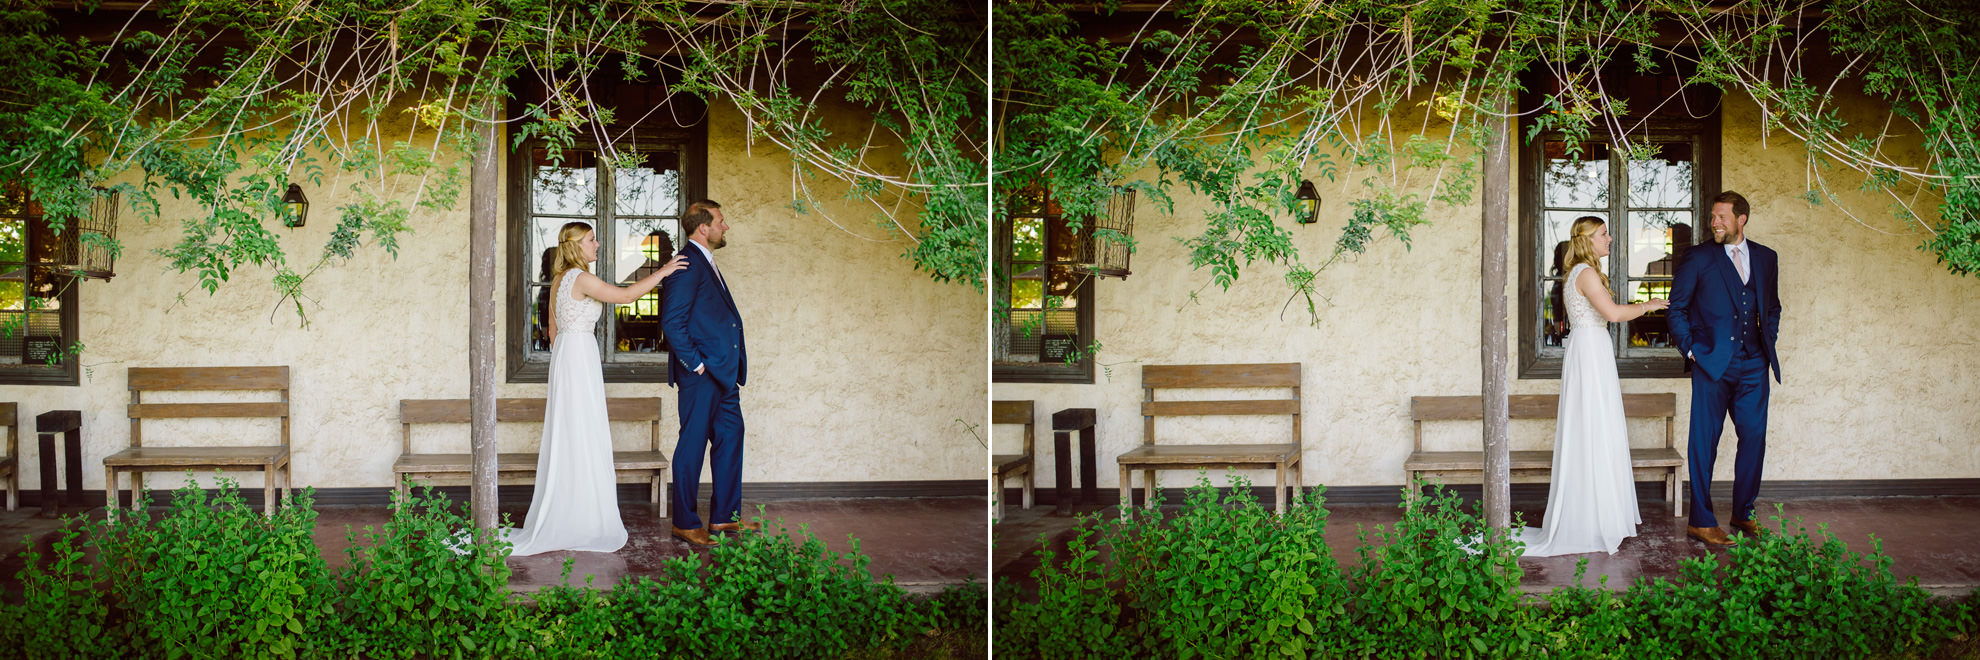 viu manent wedding_008.jpg